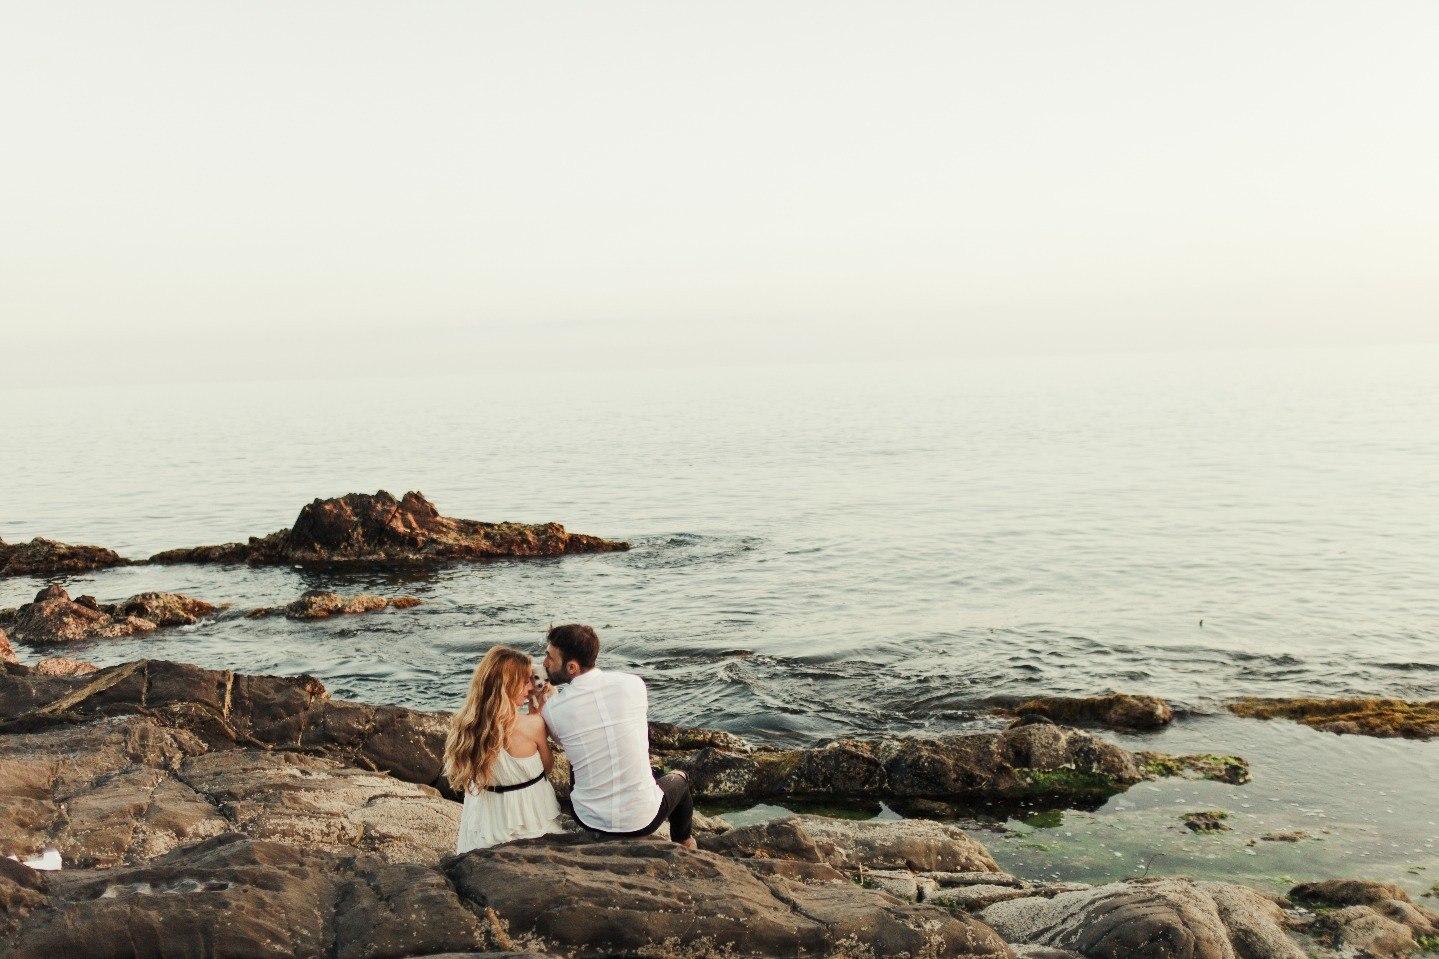 Закат на двоих: love-story на берегу моря